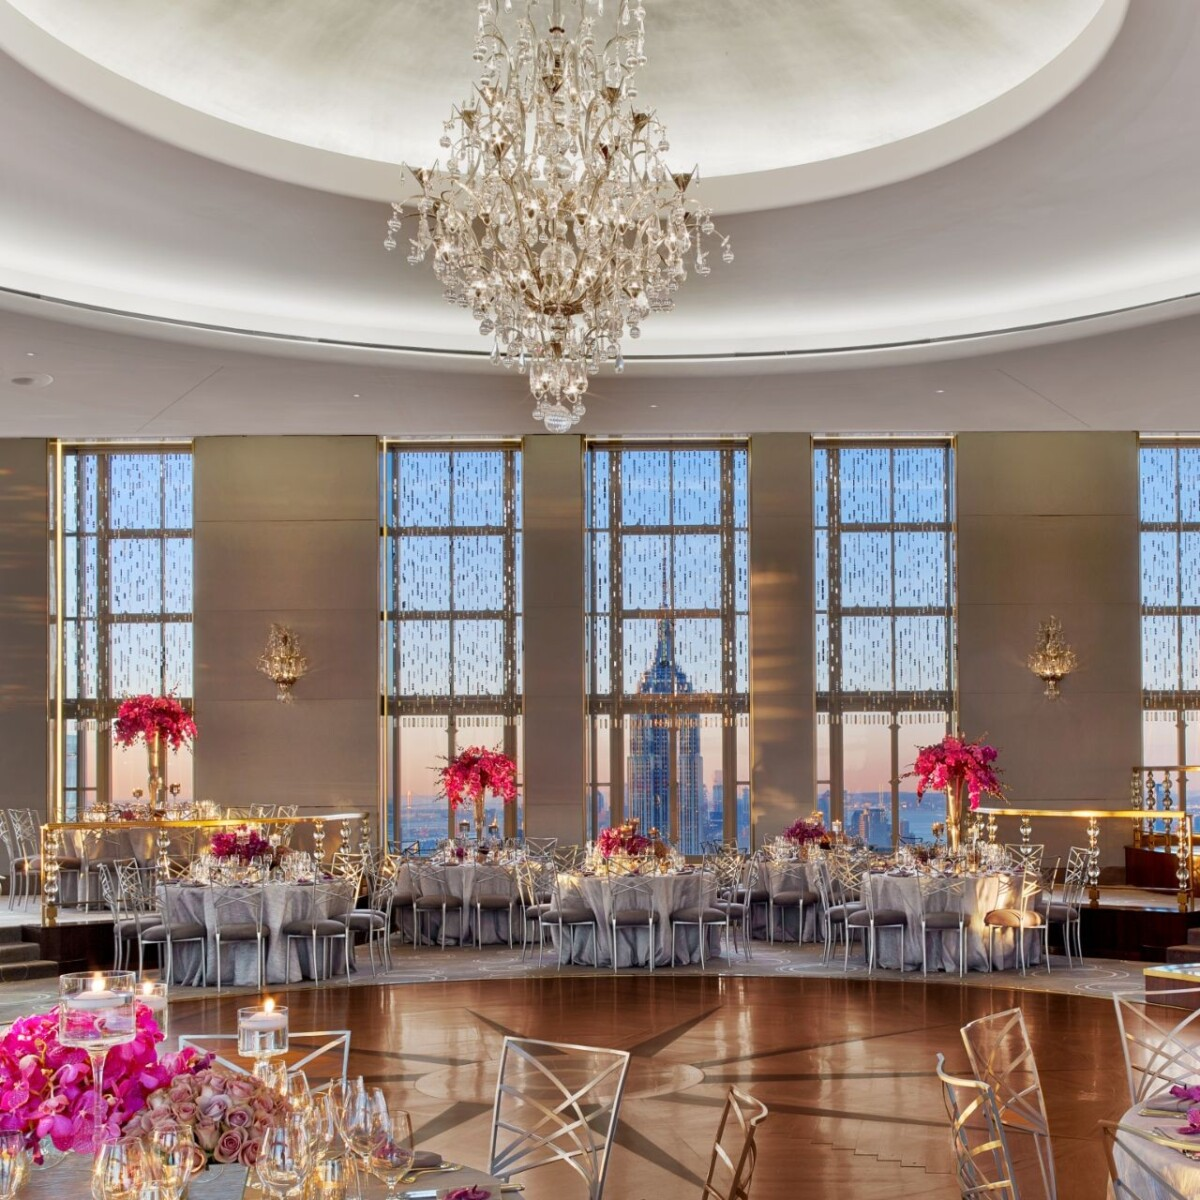 Rainbow Room restaurant